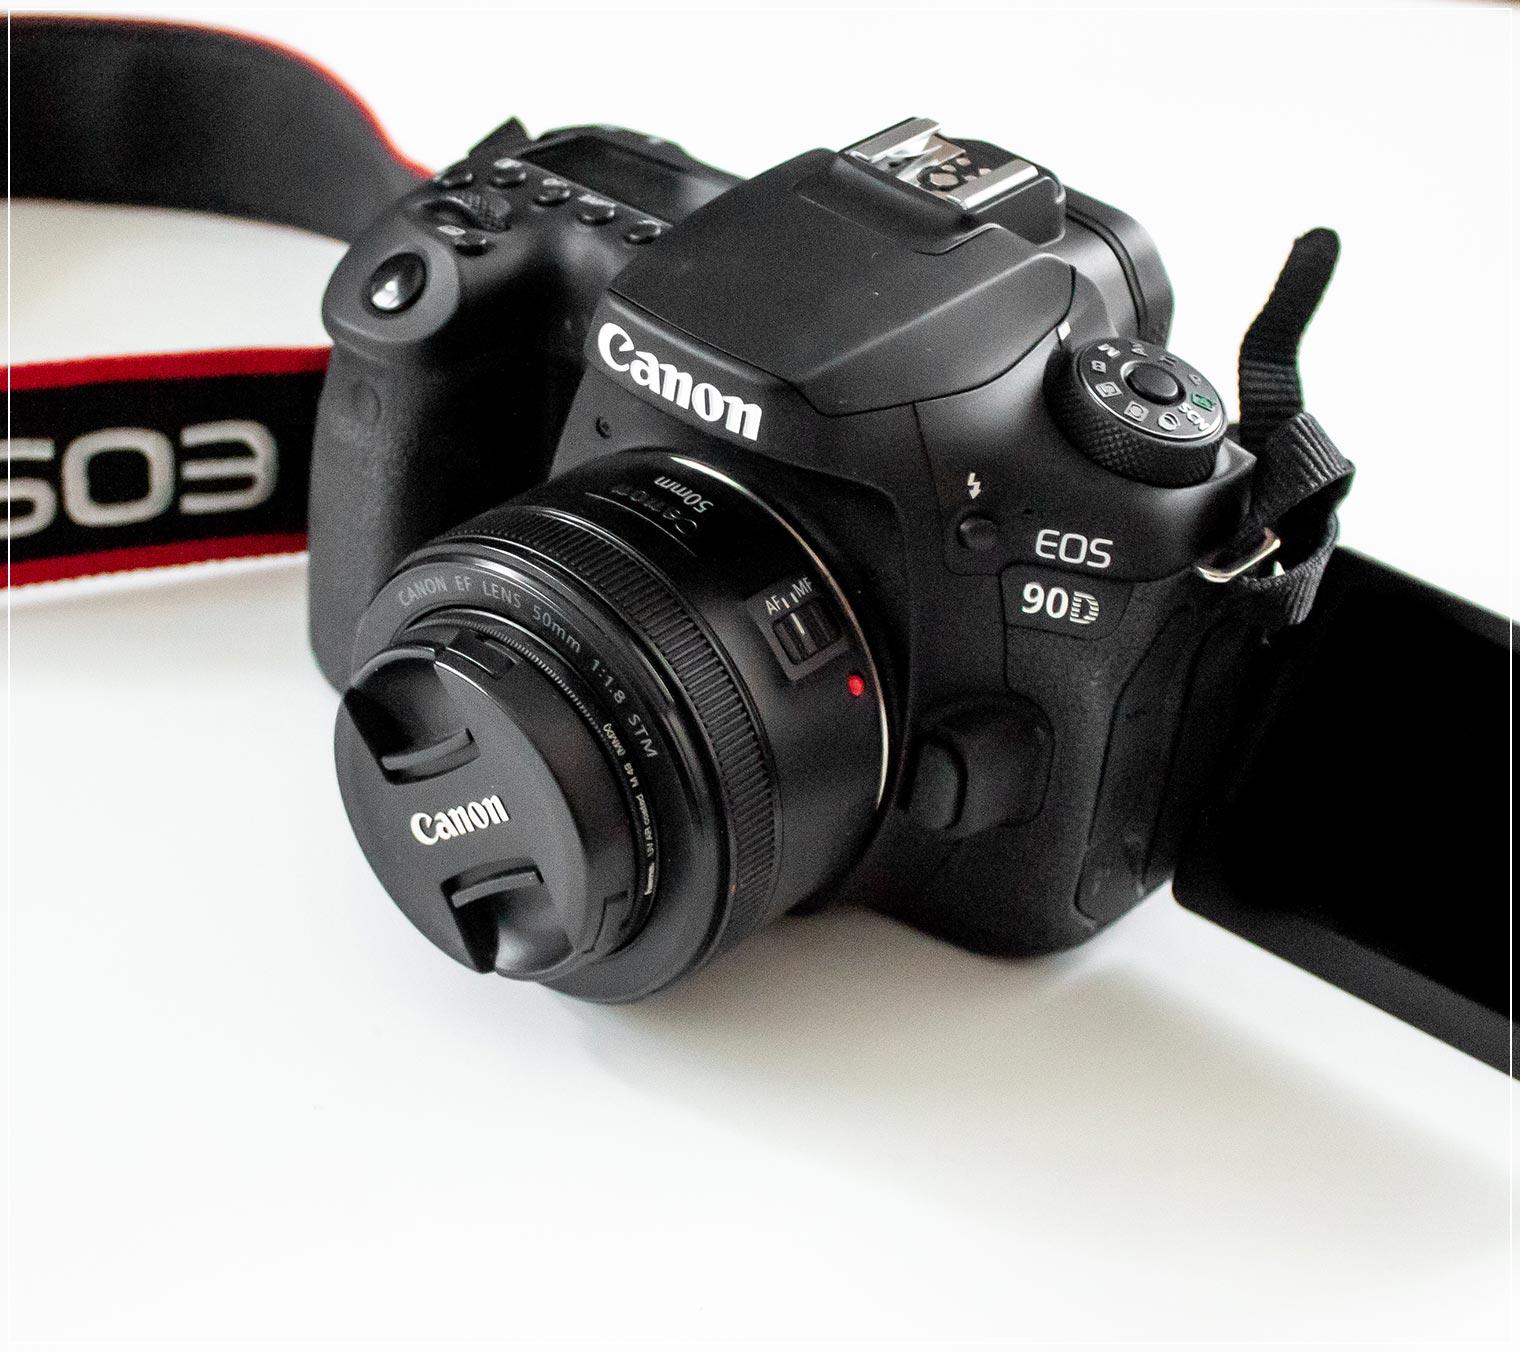 Bloggerequiment, Kamerareview meiner neuen Kamera Canon Eos90D